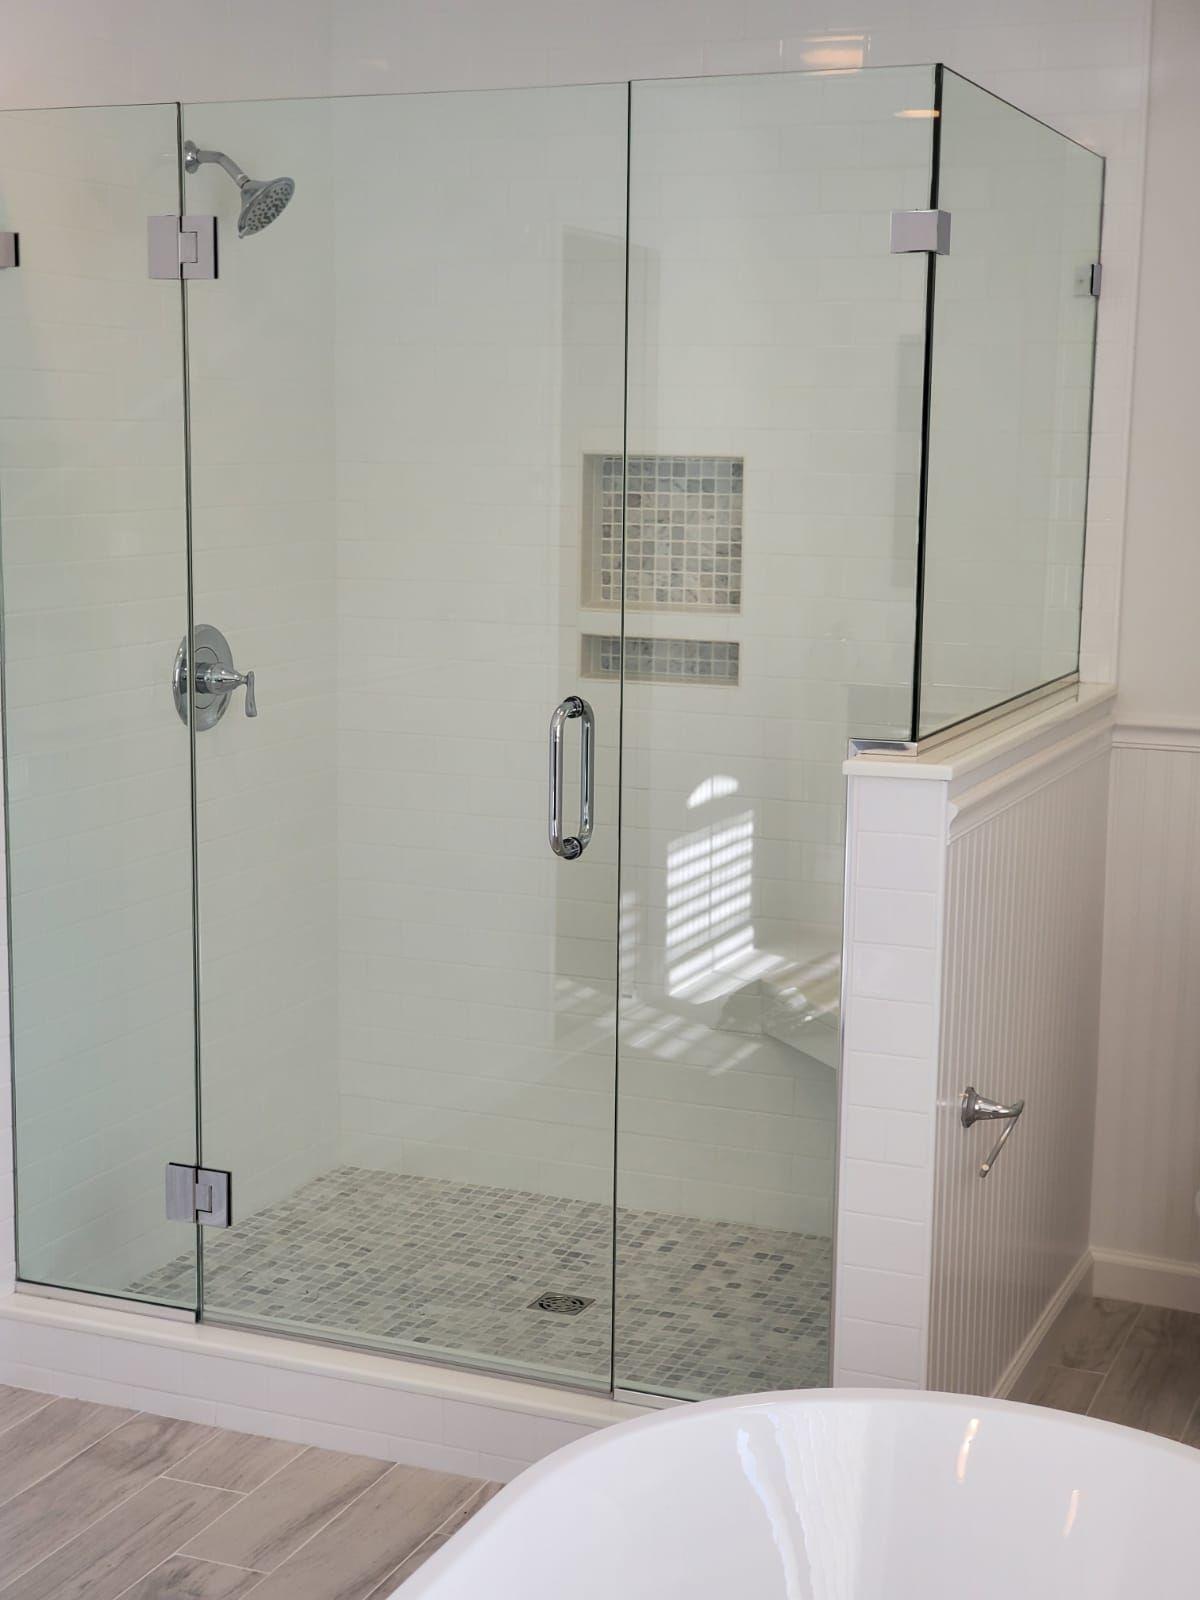 Juano S Glass Llc Design Installation Reparation Clean